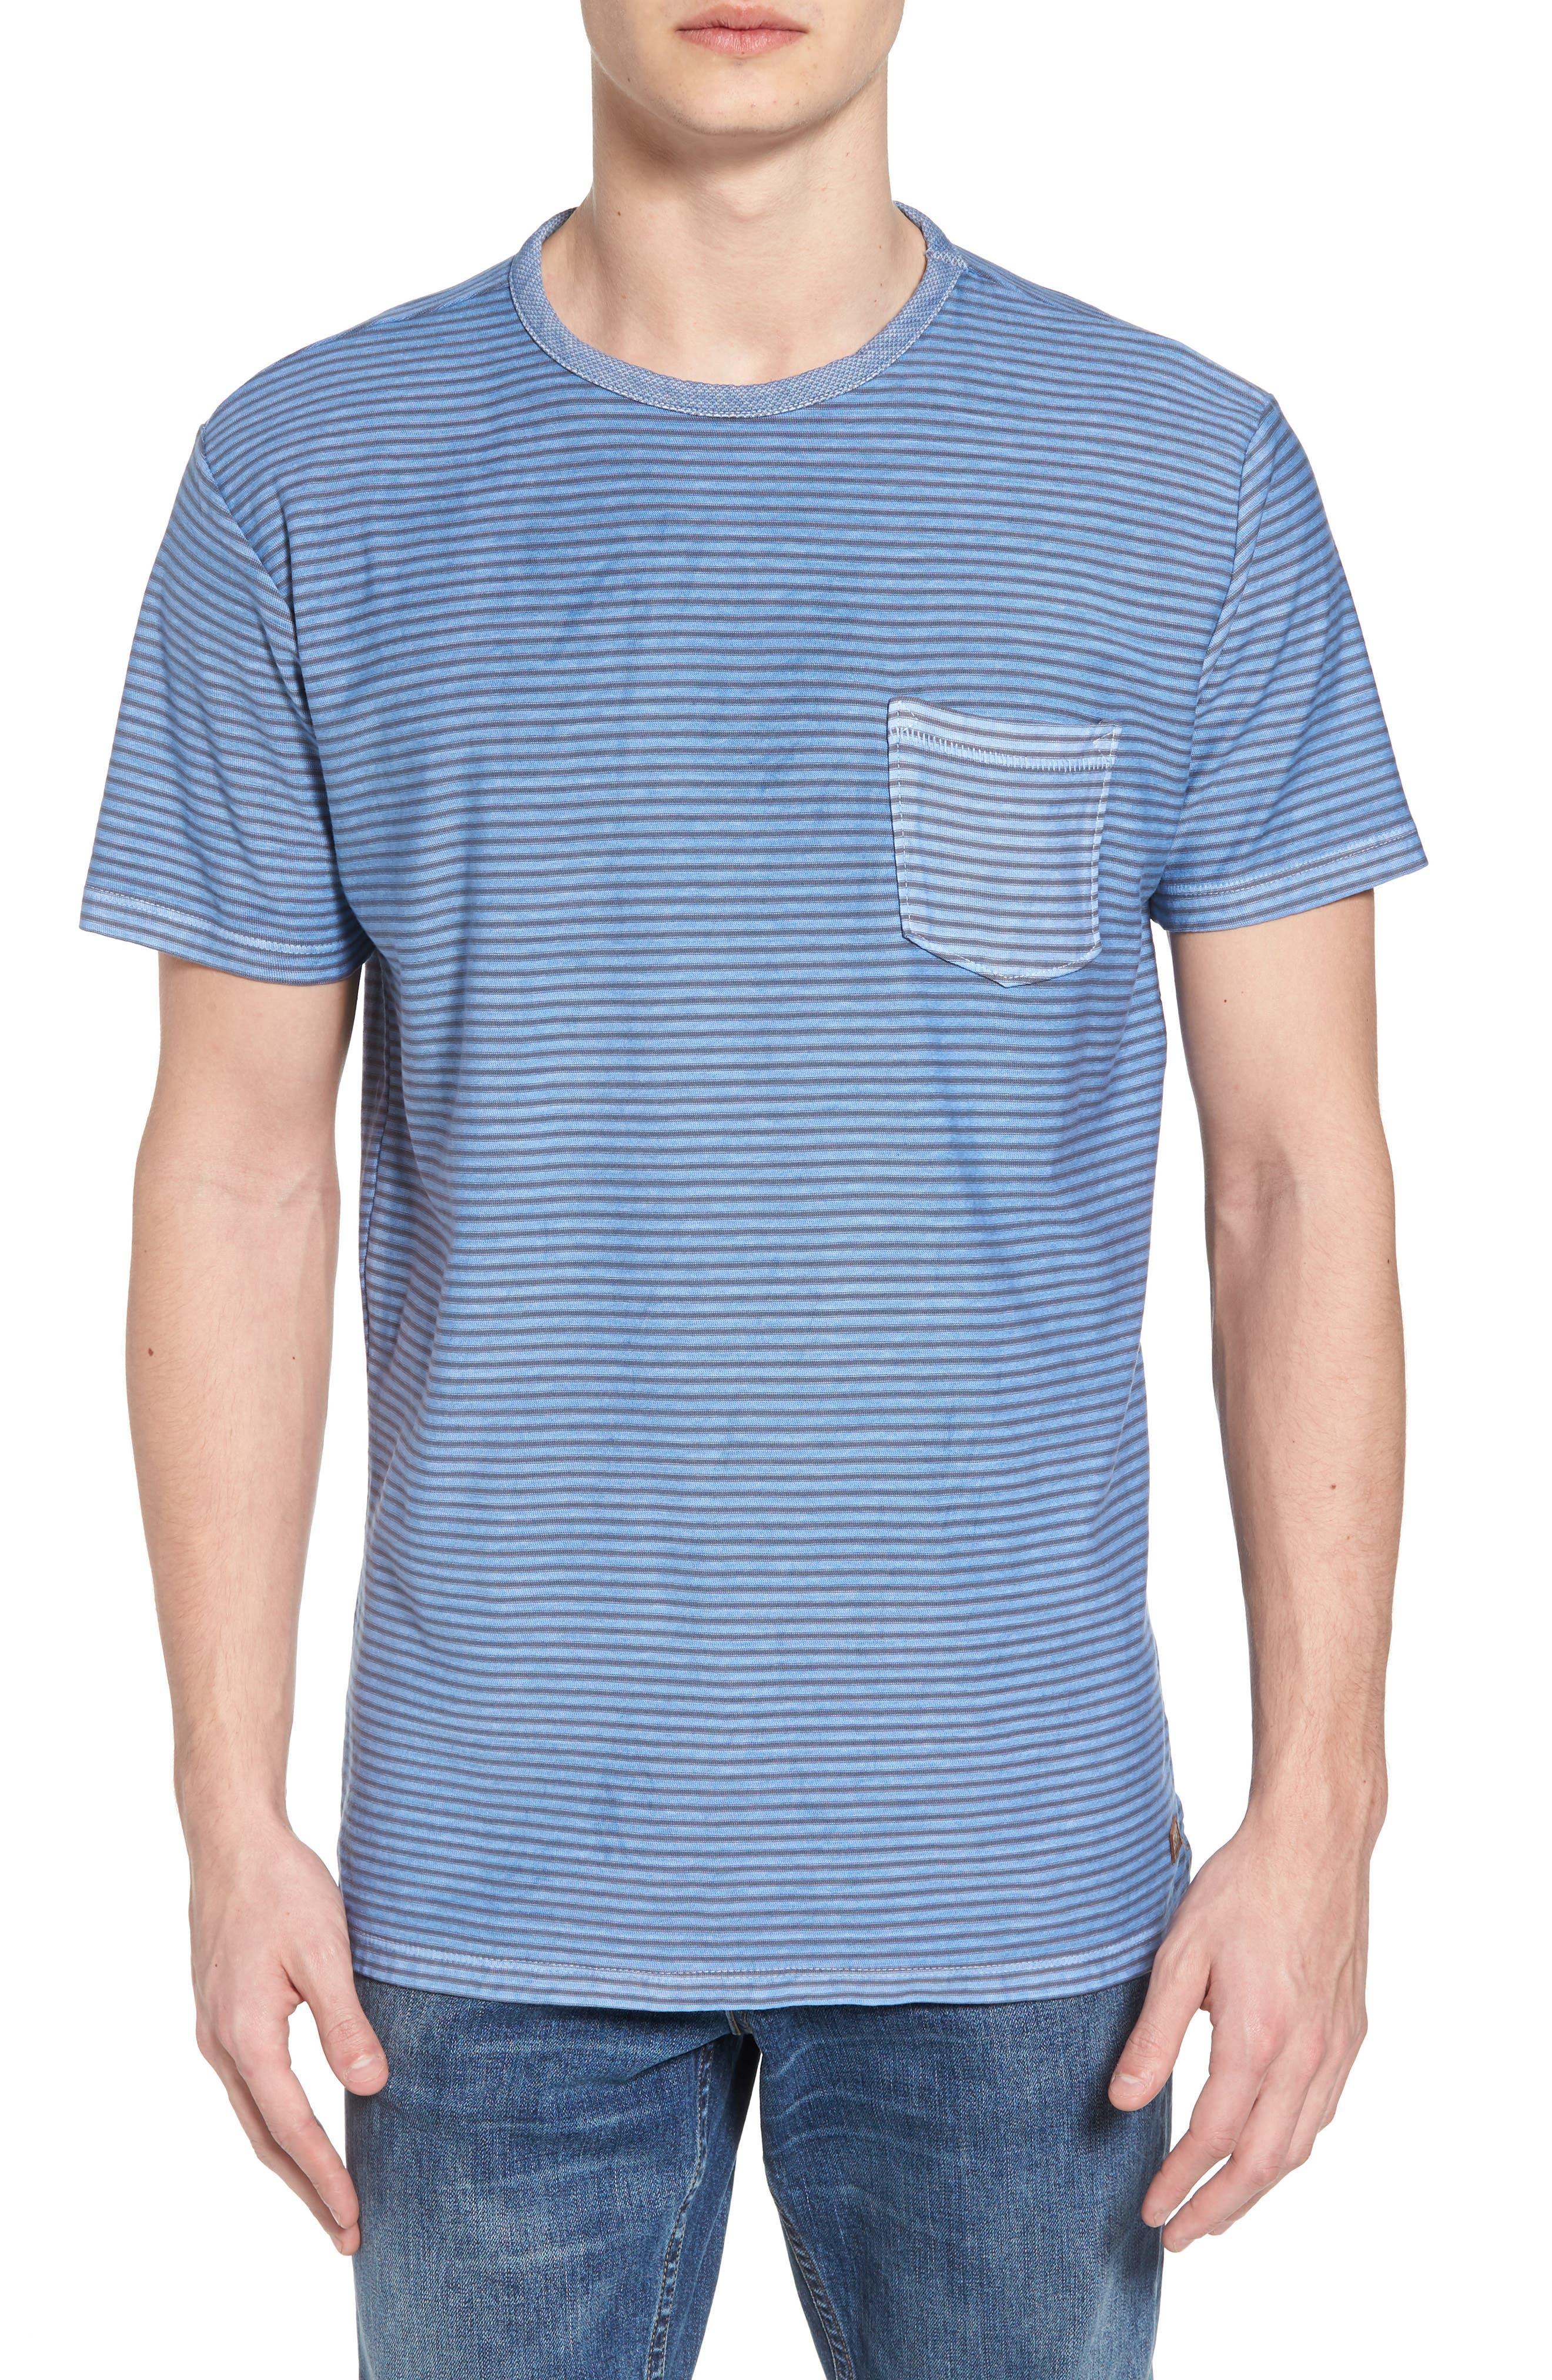 Stringer T-Shirt,                         Main,                         color, Powder Blue